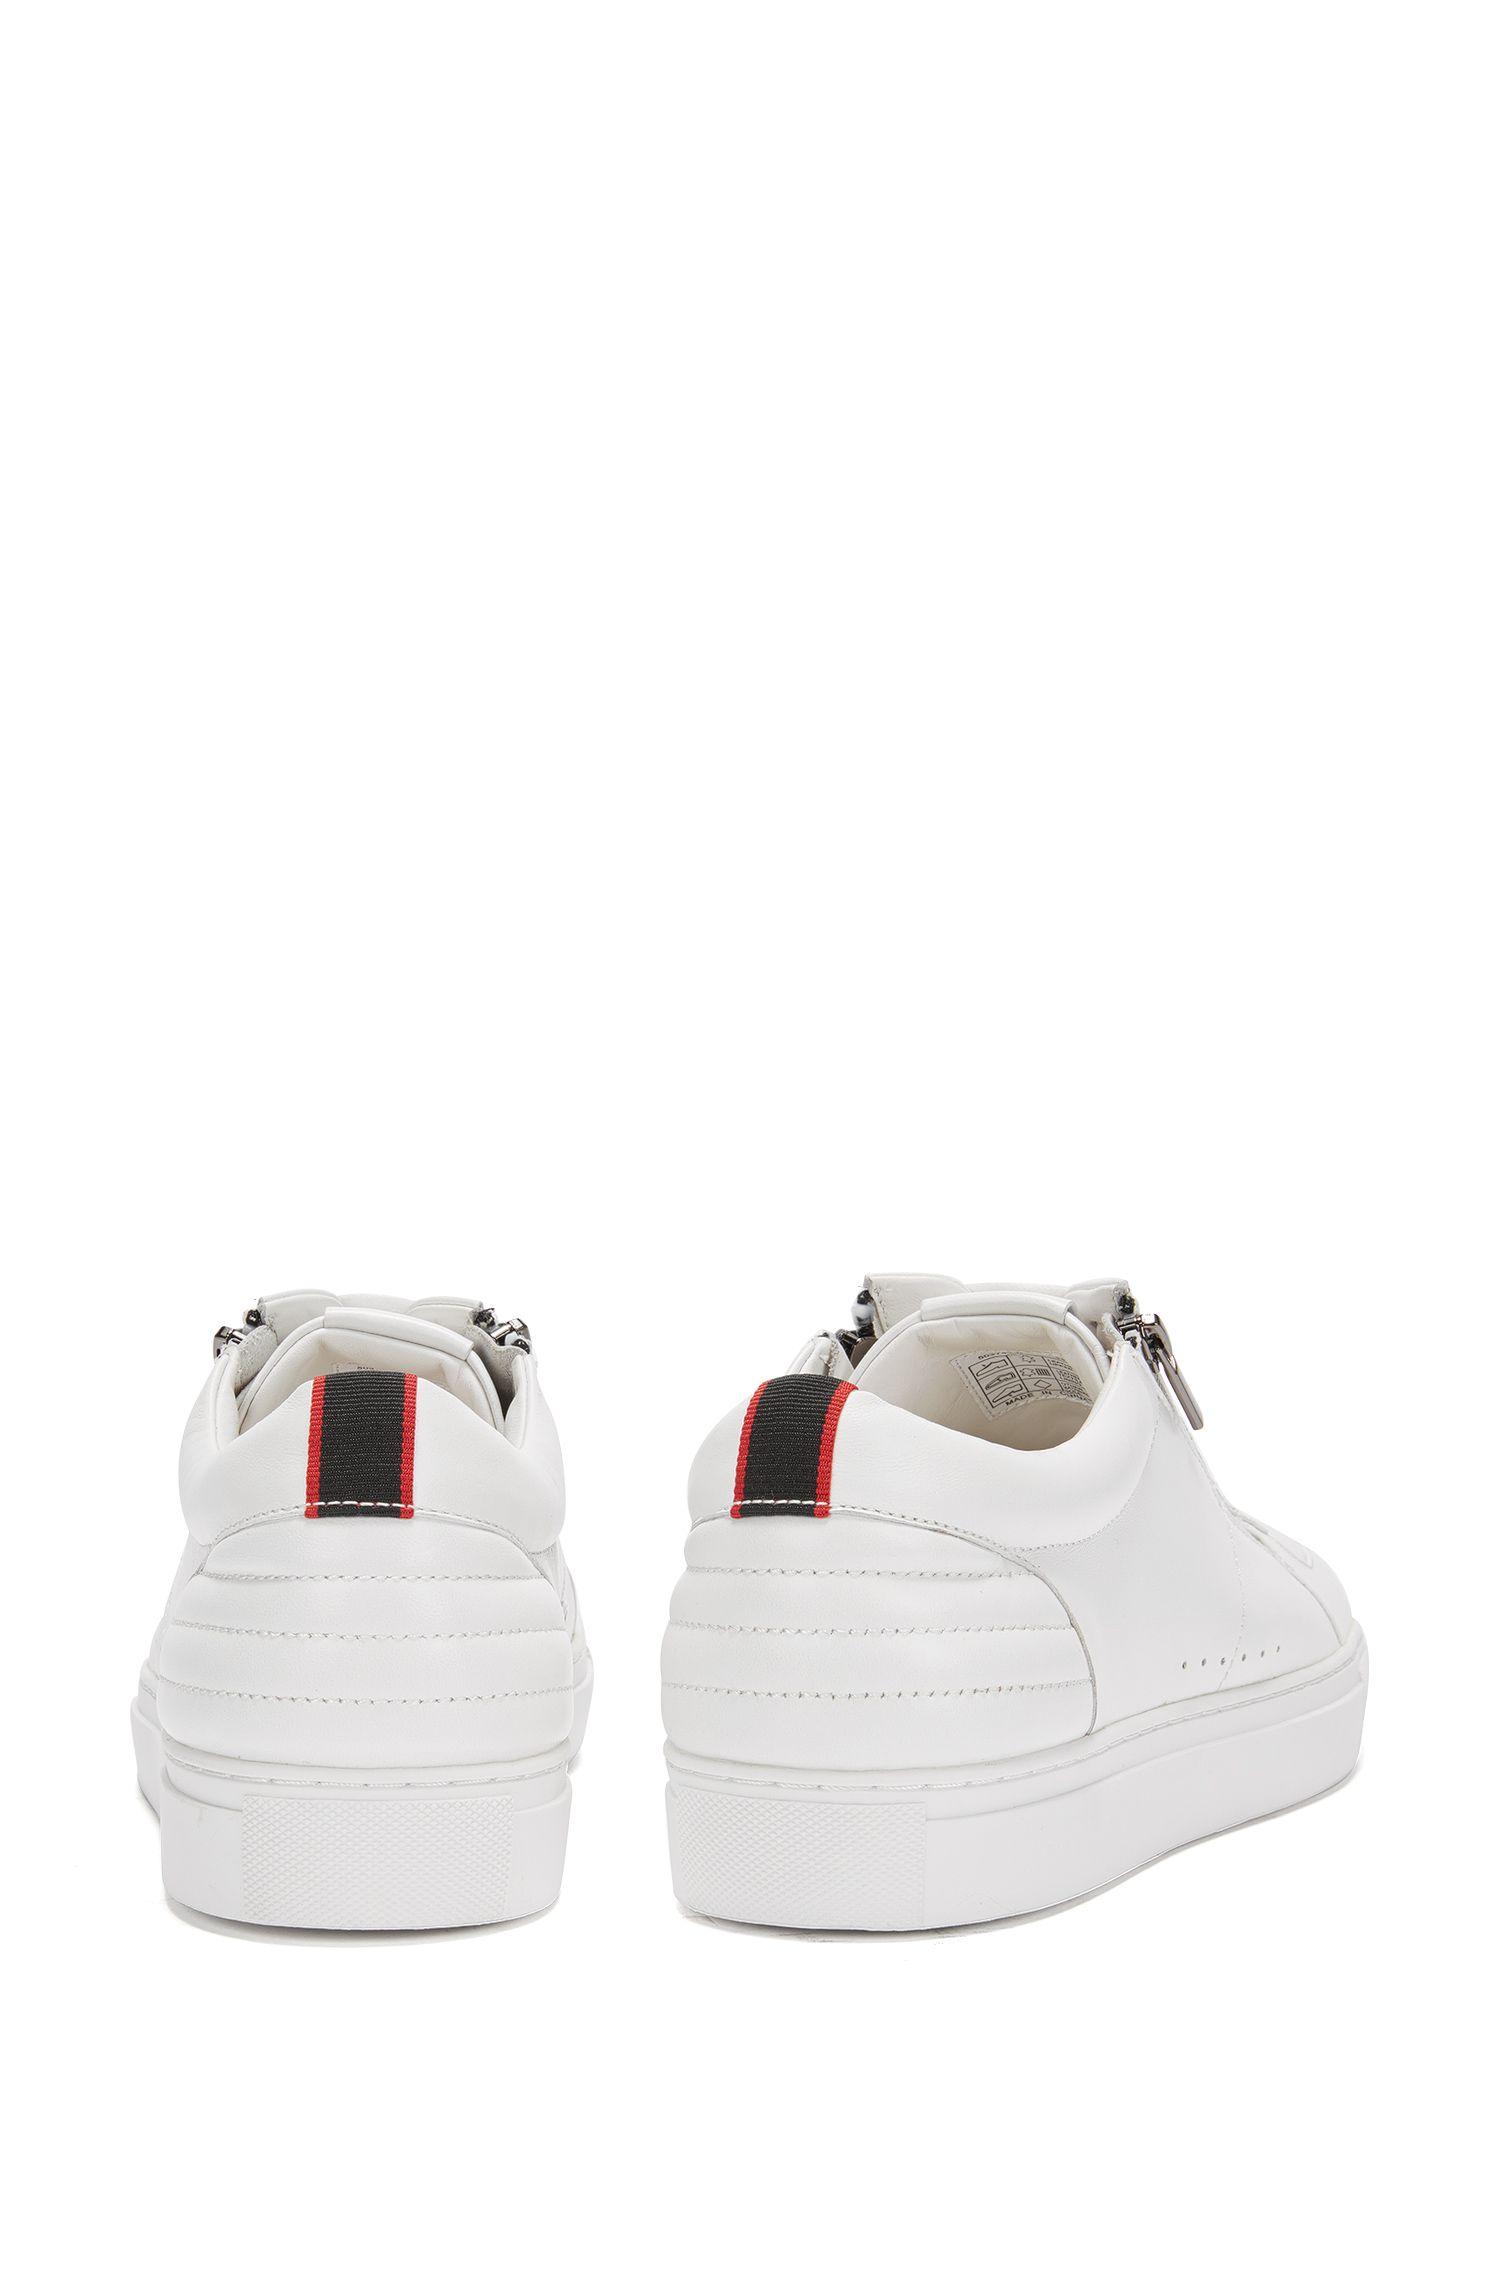 Leather Sneaker  Futurism Tenn Itmtzp